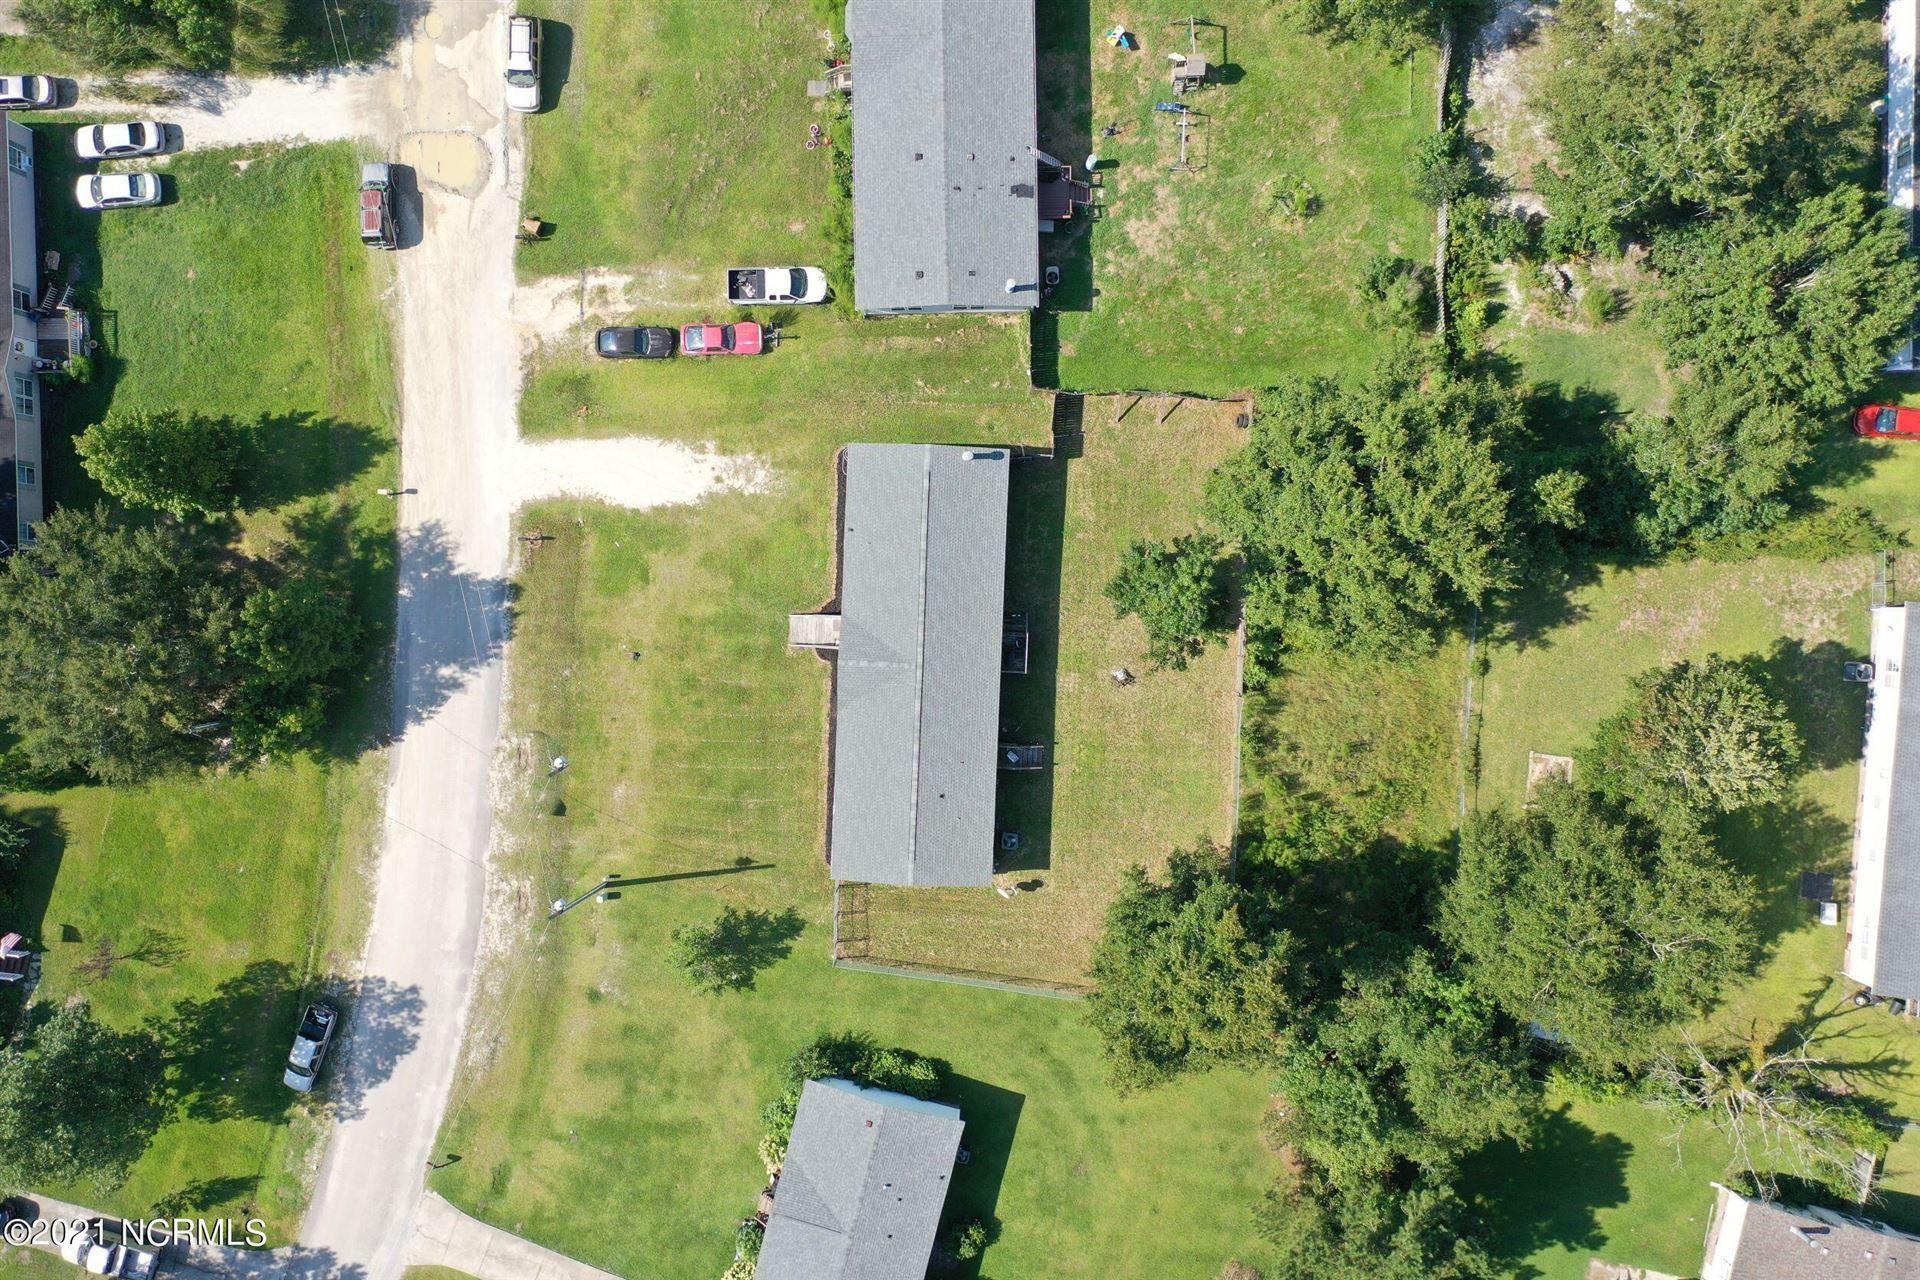 Photo of 224 Shipmans Pike, Jacksonville, NC 28546 (MLS # 100287683)